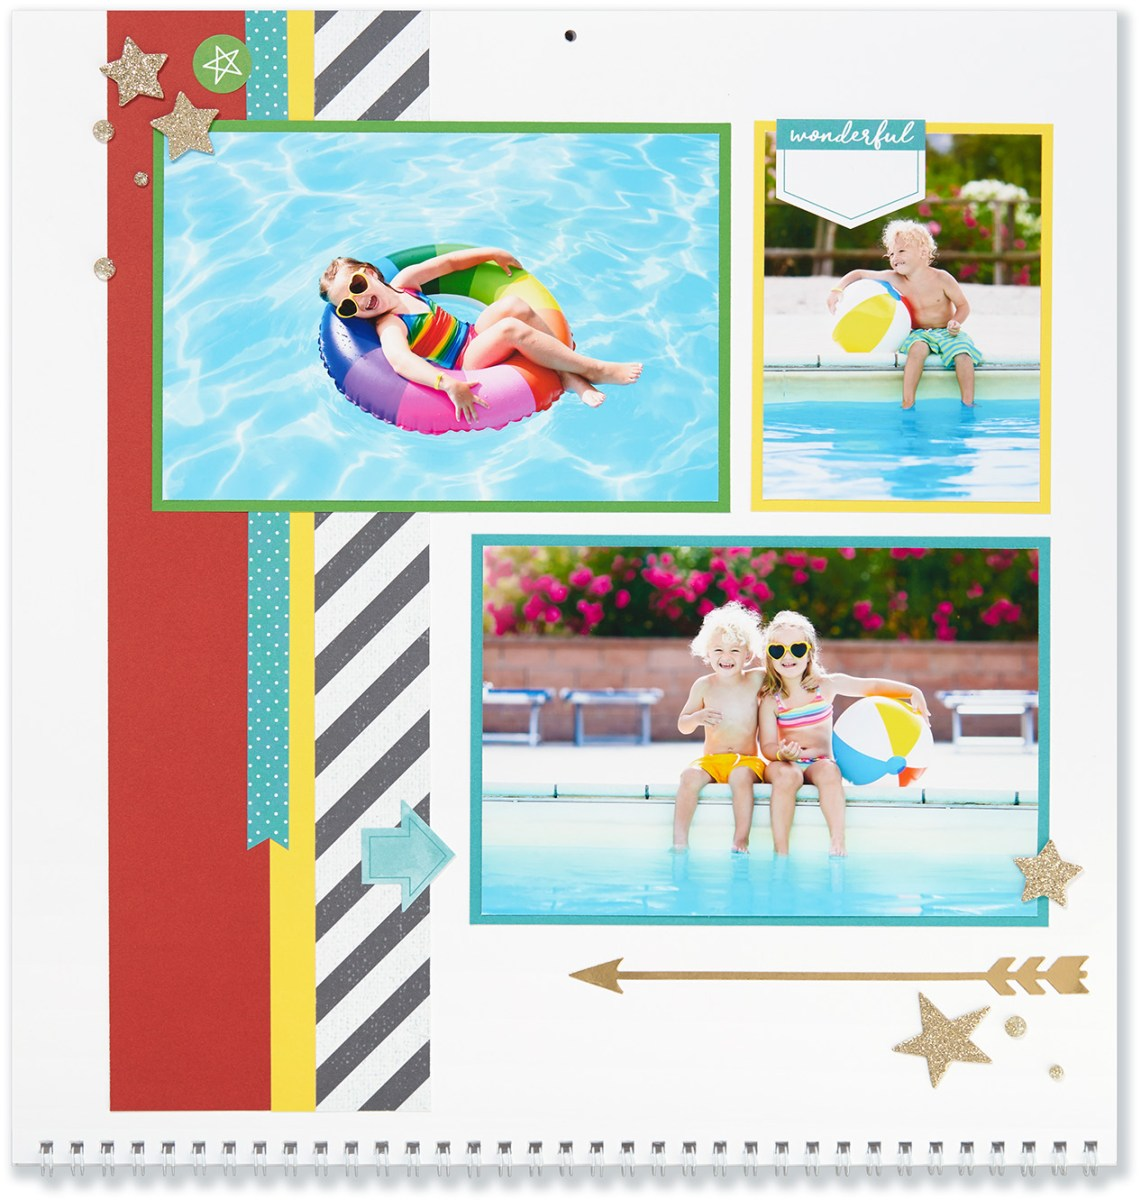 Through the Year #ctmh #closetomyheart #throughtheyear #calendar #kit #scrapbooking #scrapbook #memorykeeping #keepsake #gift #diy #family #Chrismas #present #photos #gold #glitter #diecut #gems #stars #arrow #summer